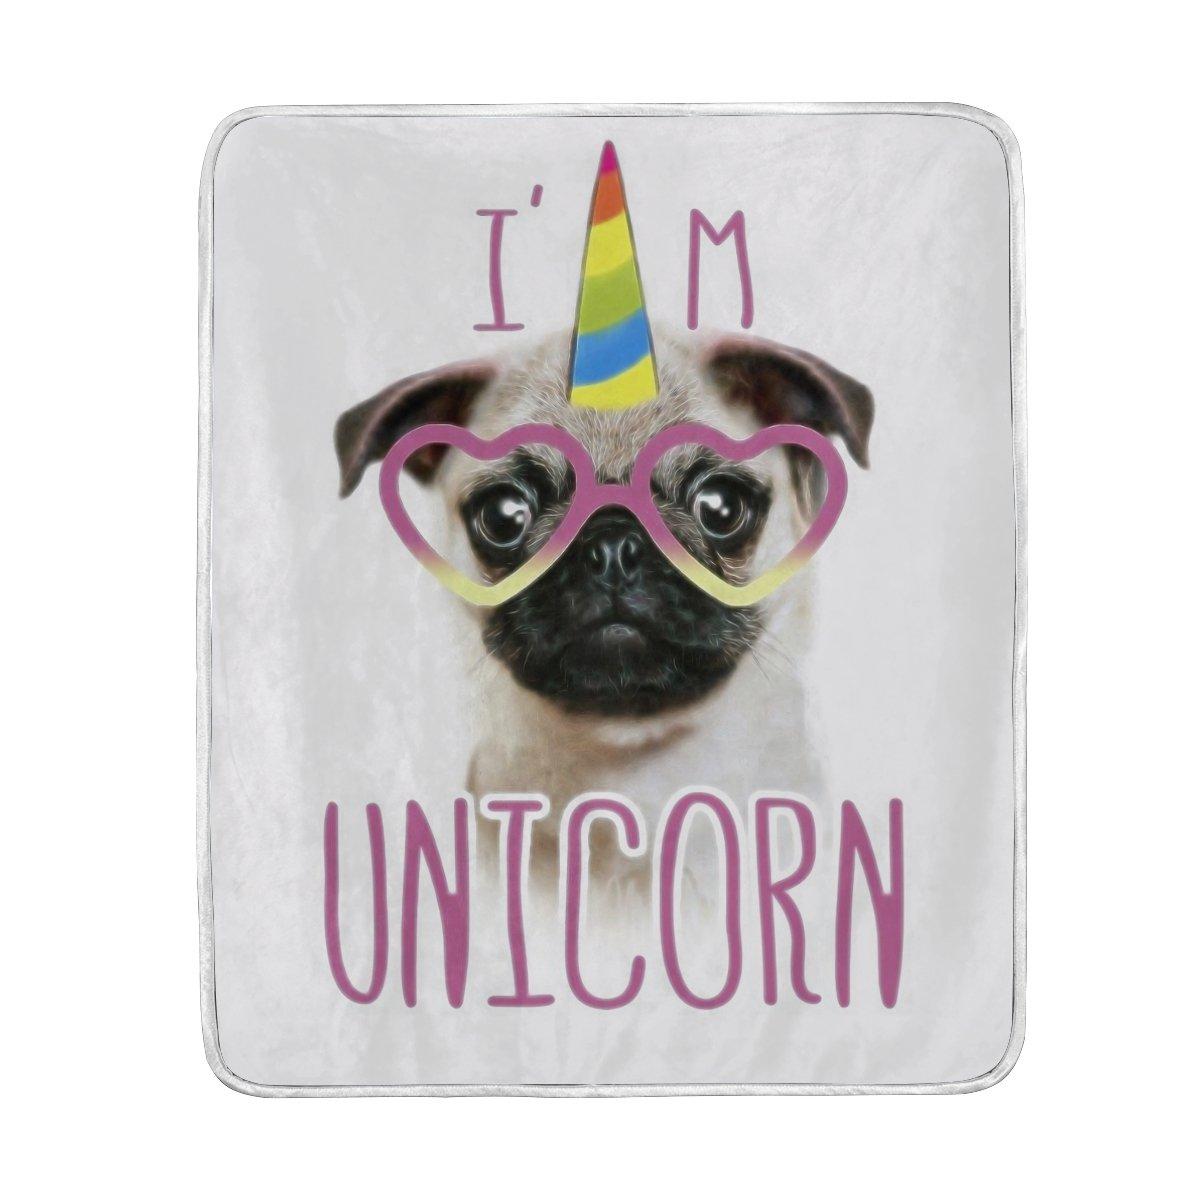 ALAZA Rainbow Unicorn Cat Animal Plush Throws Siesta Camping Travel Fleece Blankets Lightweight Bed SOFE Size 50x60inches